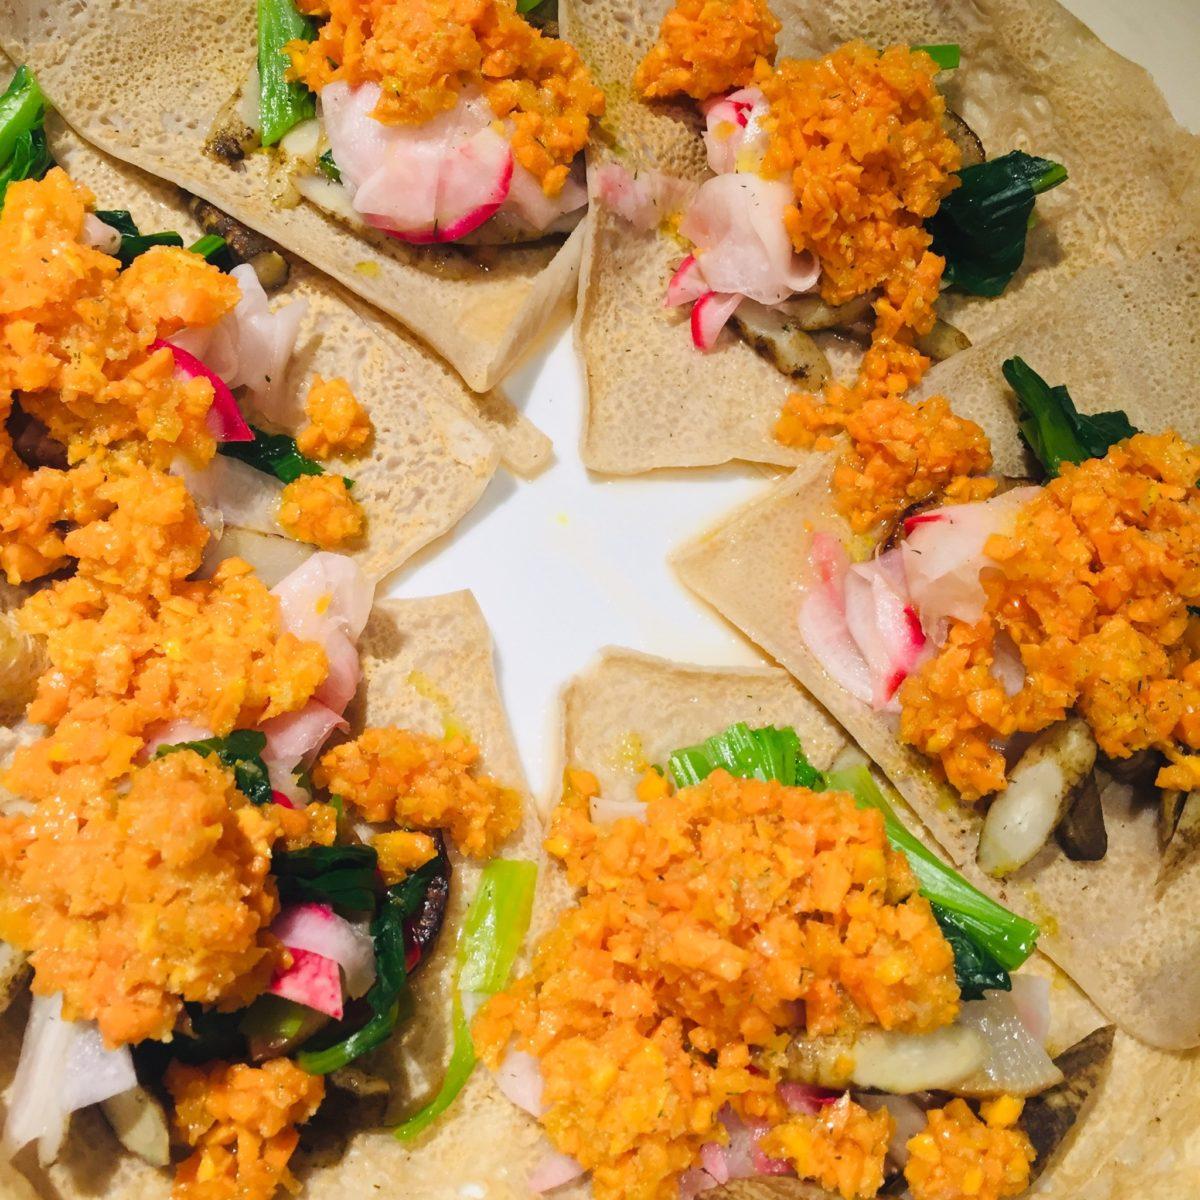 D&DEPARTMENT YAMANASHI FOUR HEATS CAFEで食べたガレットサラダ